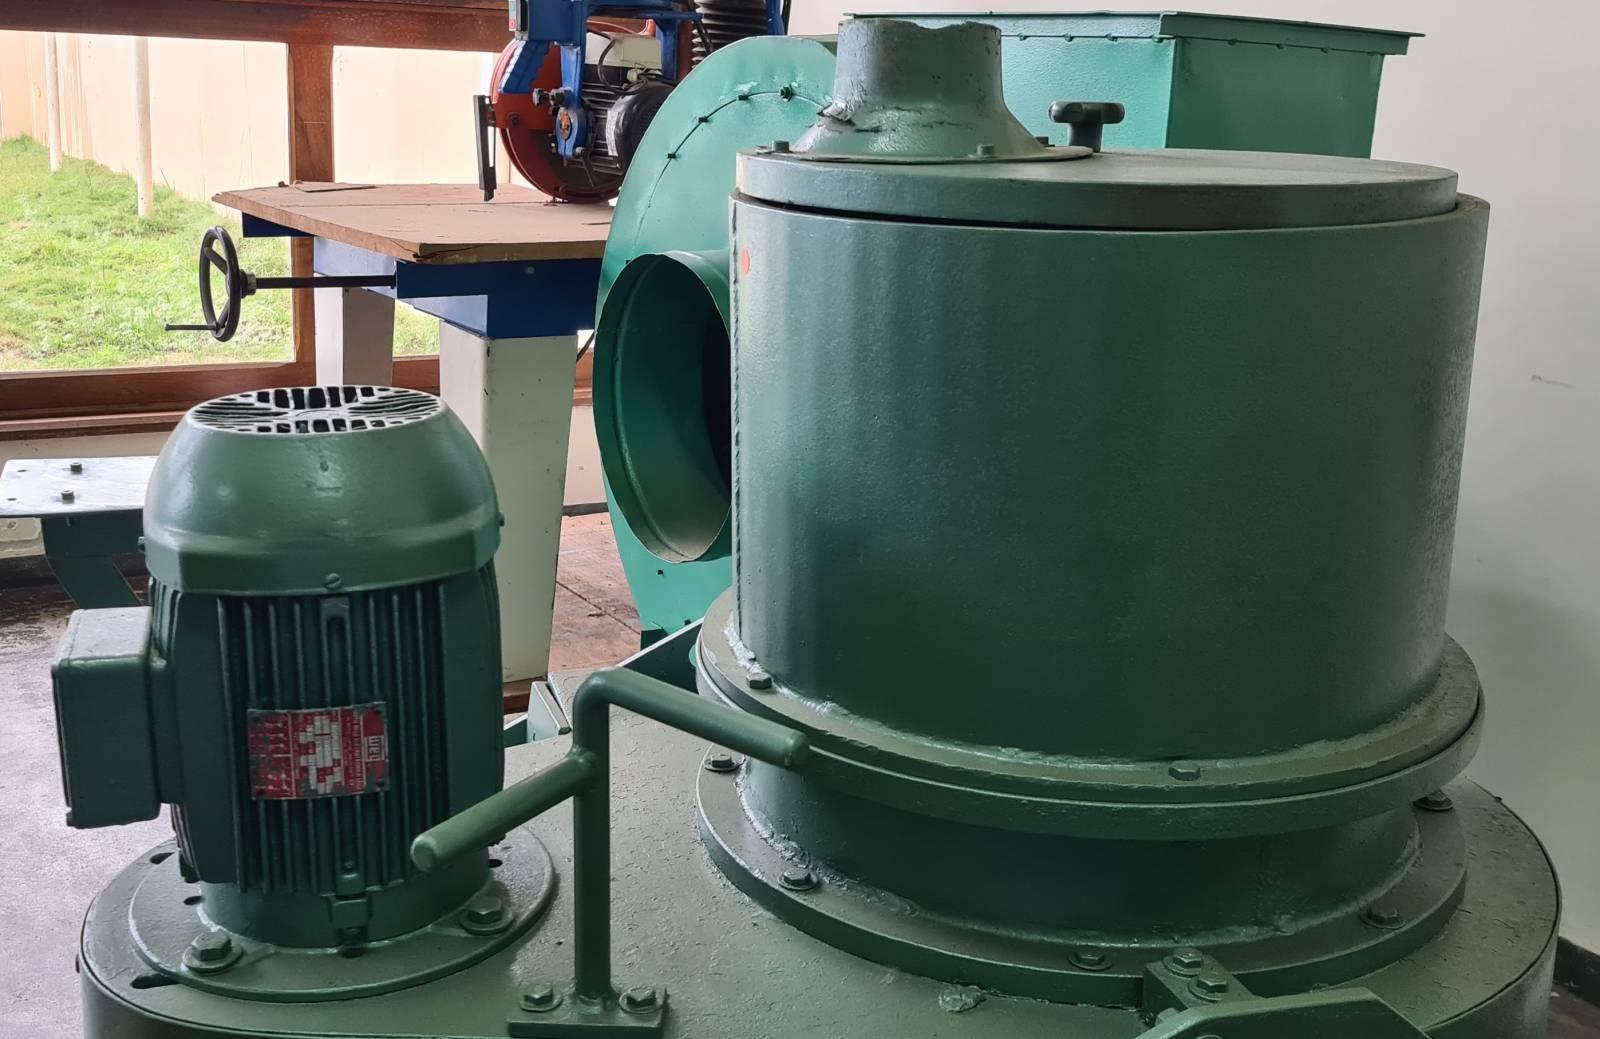 Lixadeira de tambor marca Sirma - Kimaq